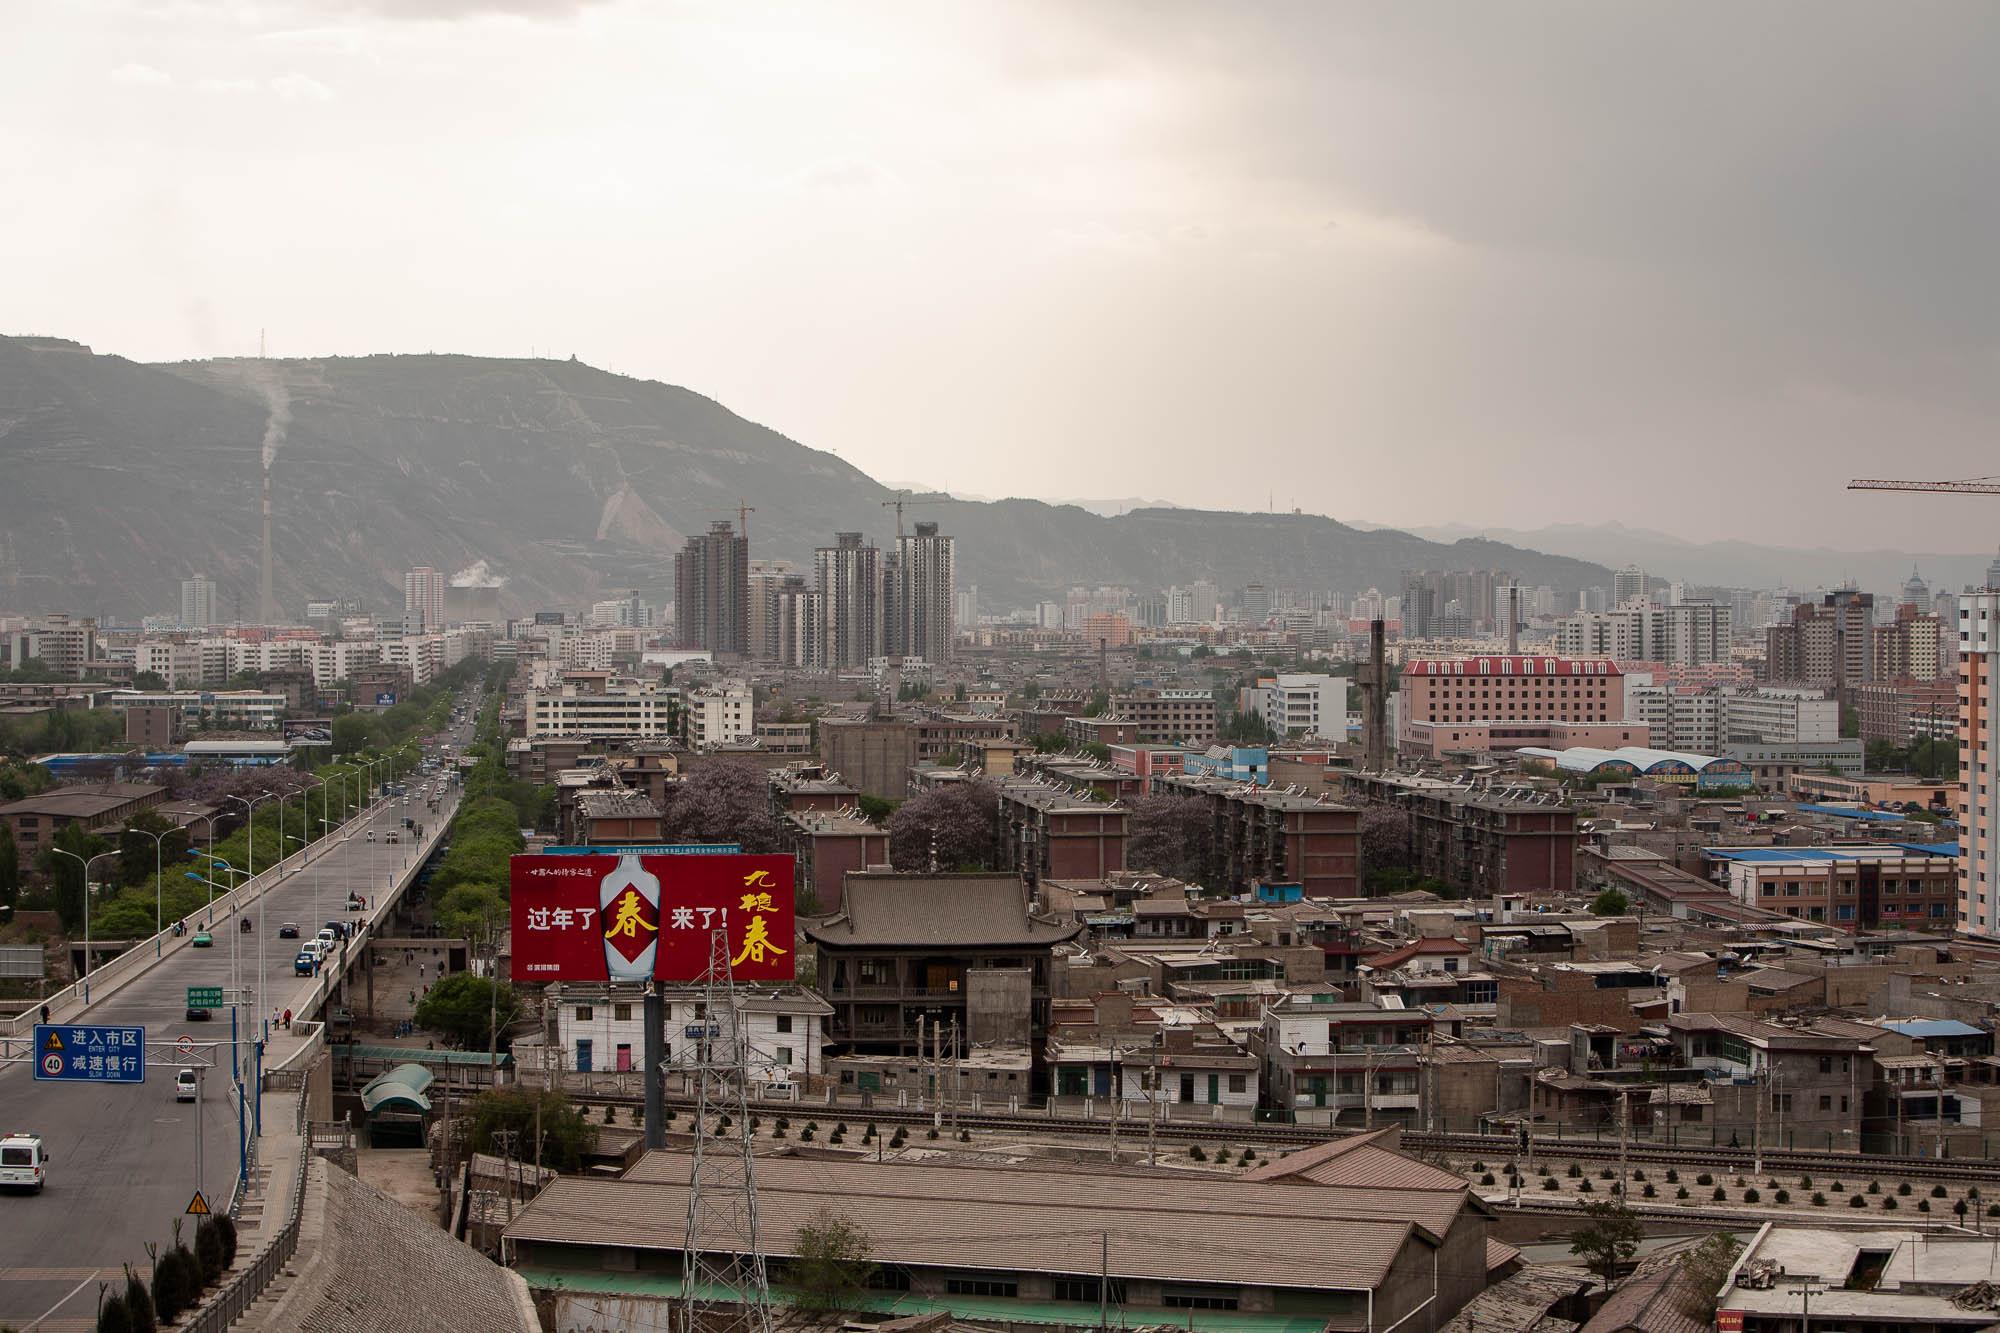 into Lanzhou